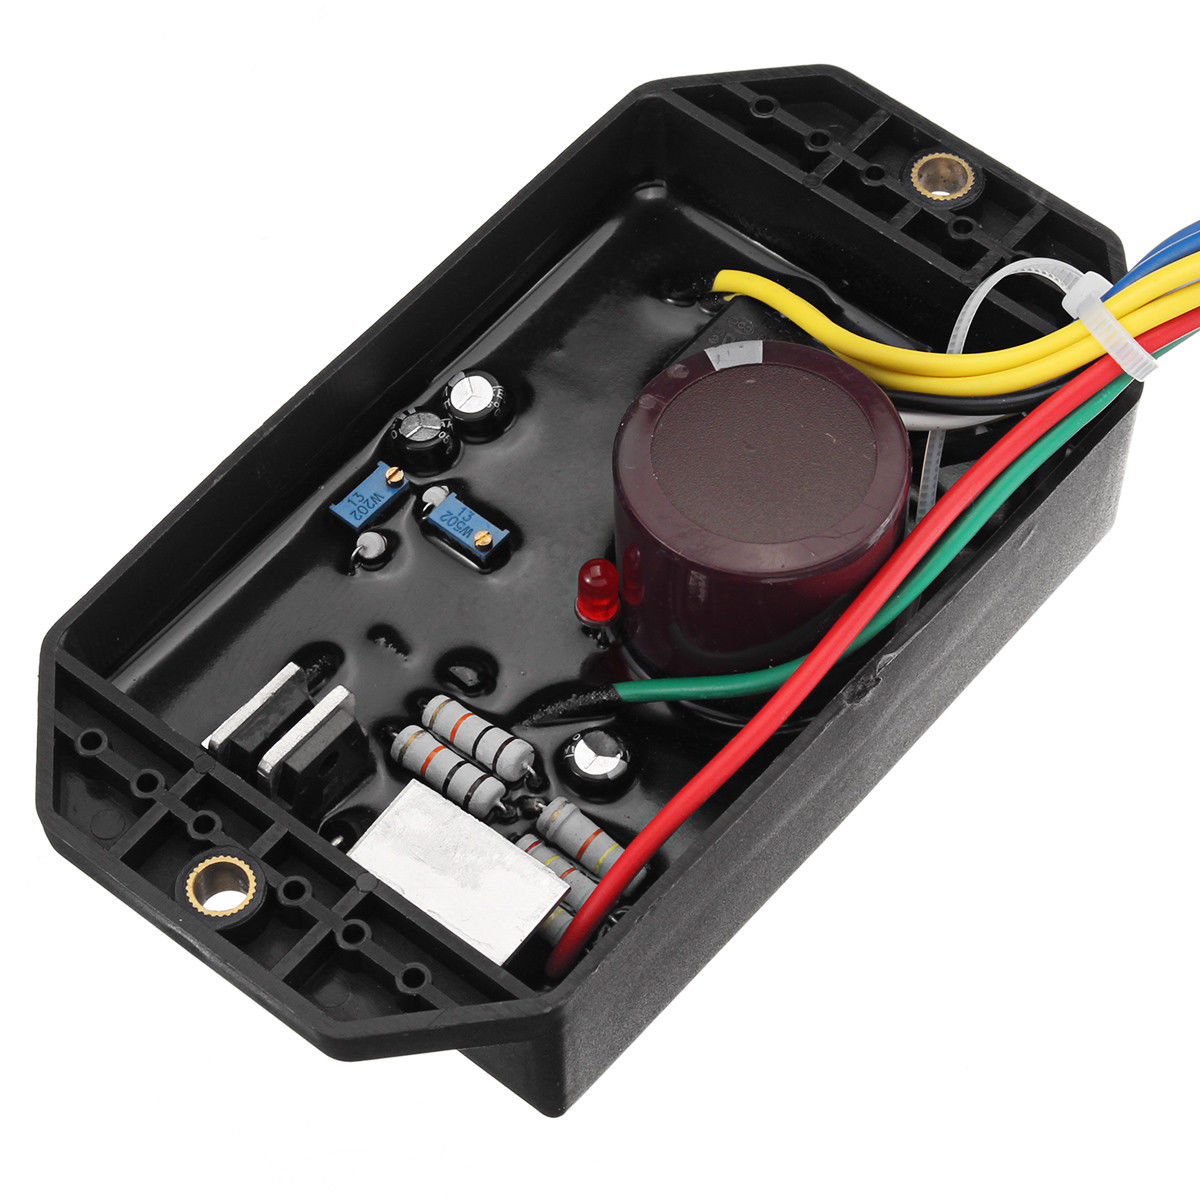 1*Voltage Regulator 5KW Diesel Generator Voltage Regulator AVR for Kipor Kama KDE5000 6500 67001*Voltage Regulator 5KW Diesel Generator Voltage Regulator AVR for Kipor Kama KDE5000 6500 6700